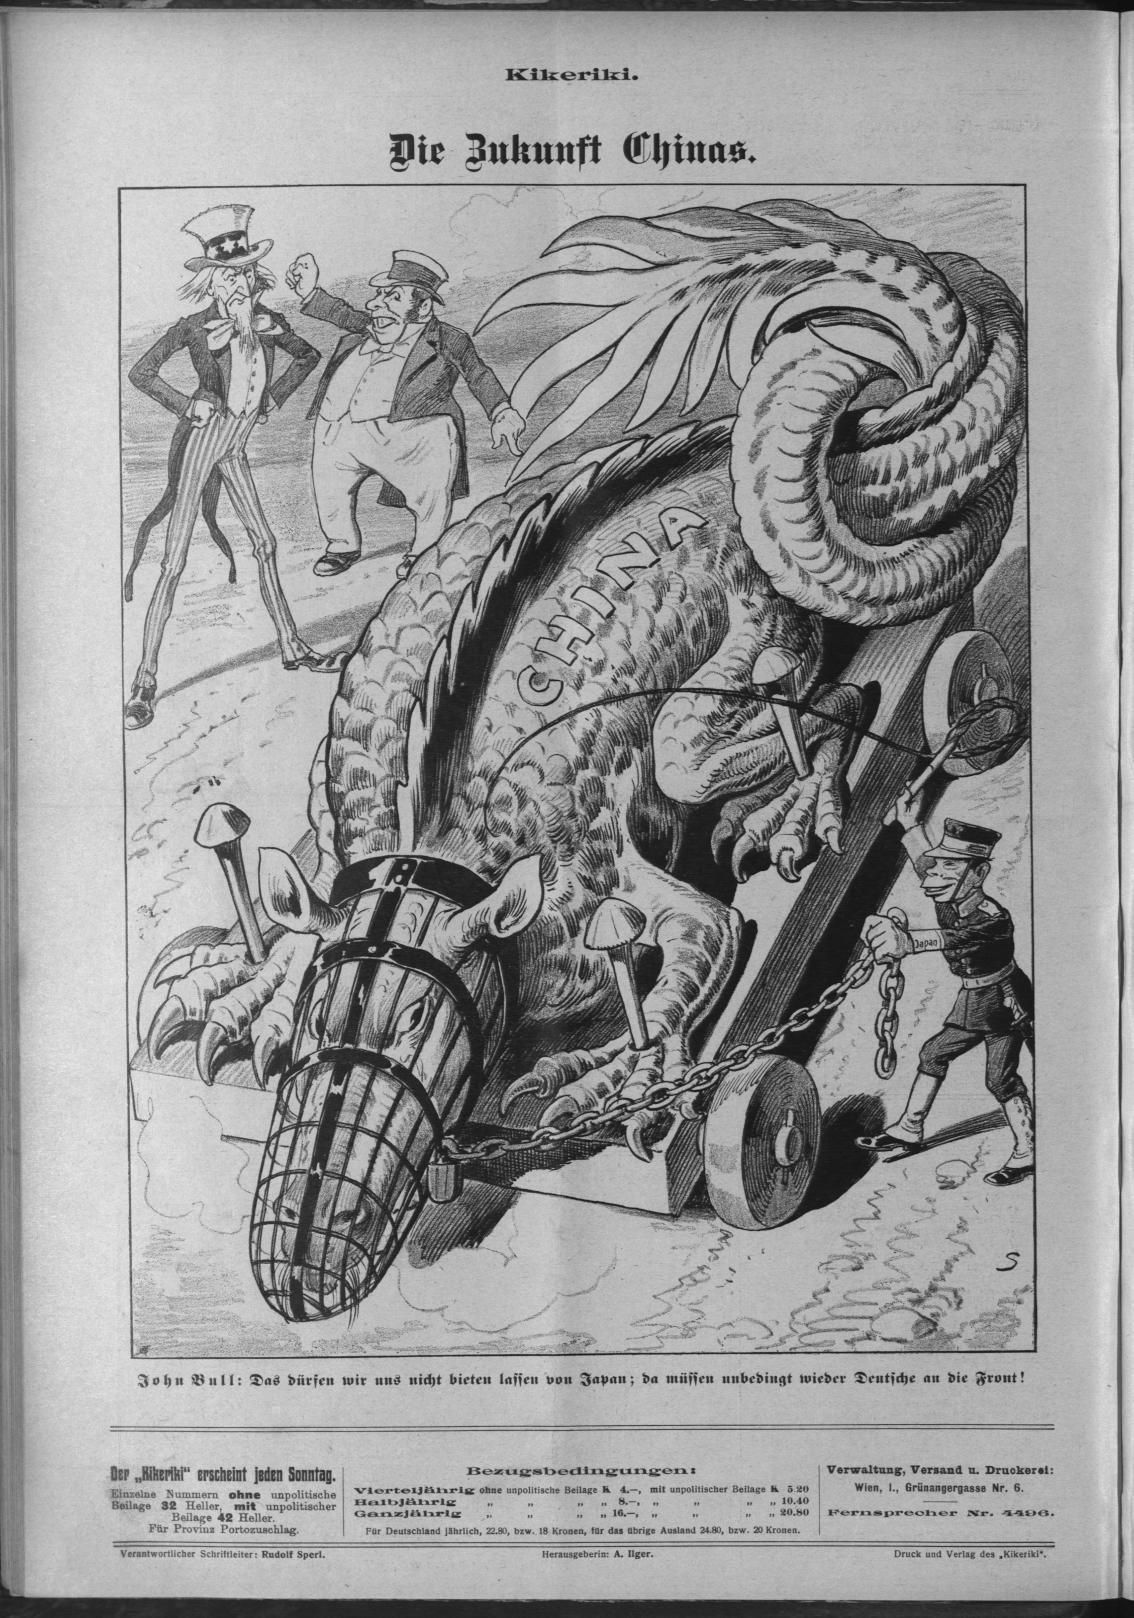 Kikeriki (7.3.1915)